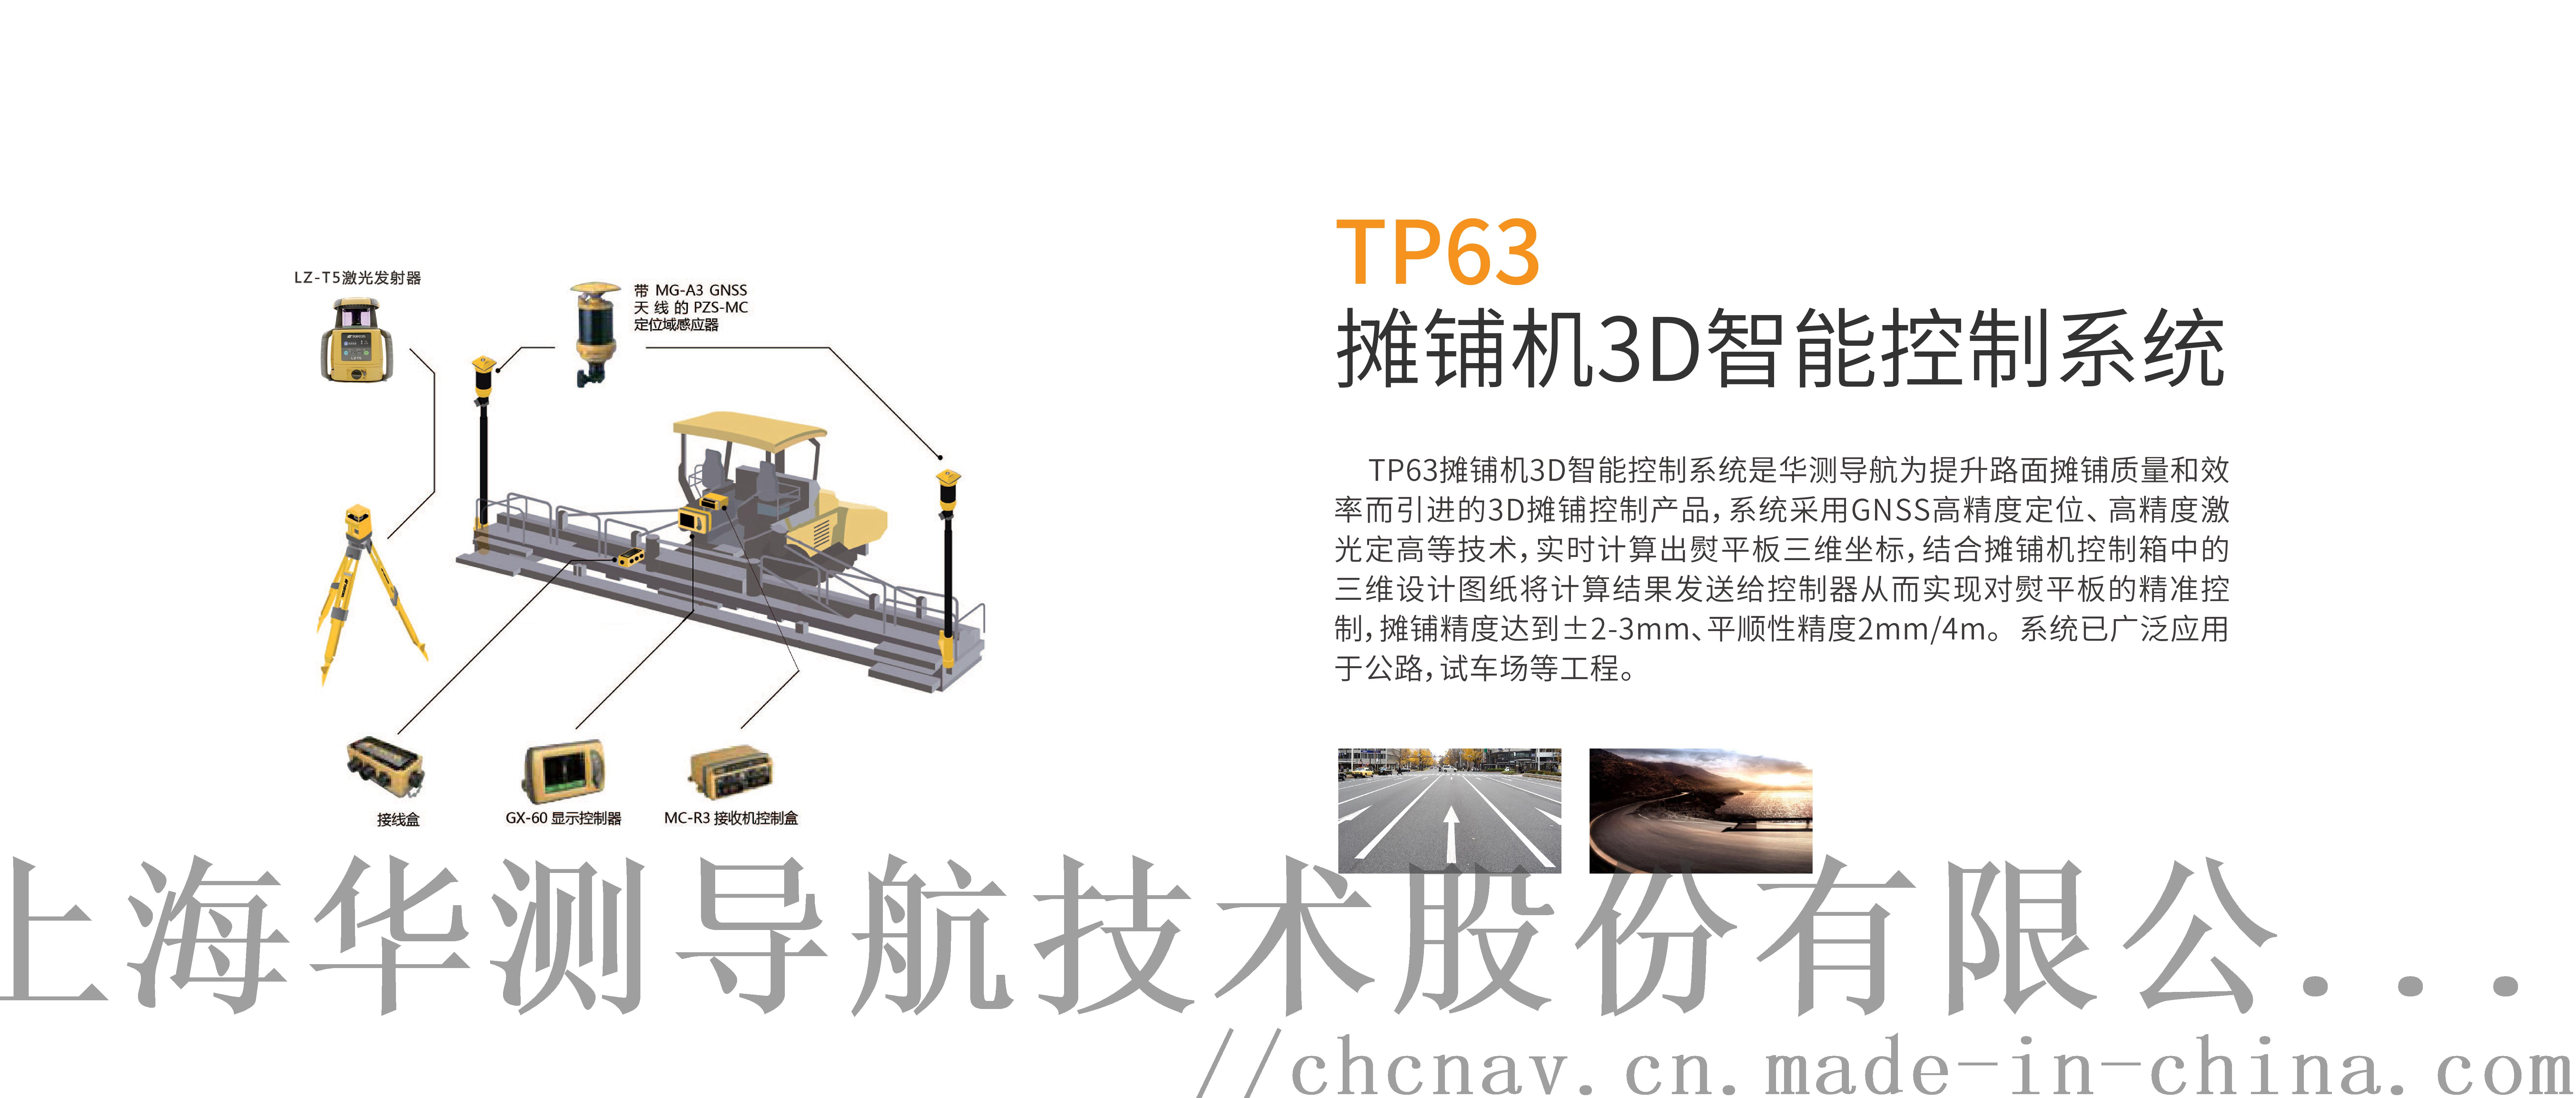 TP63.jpg